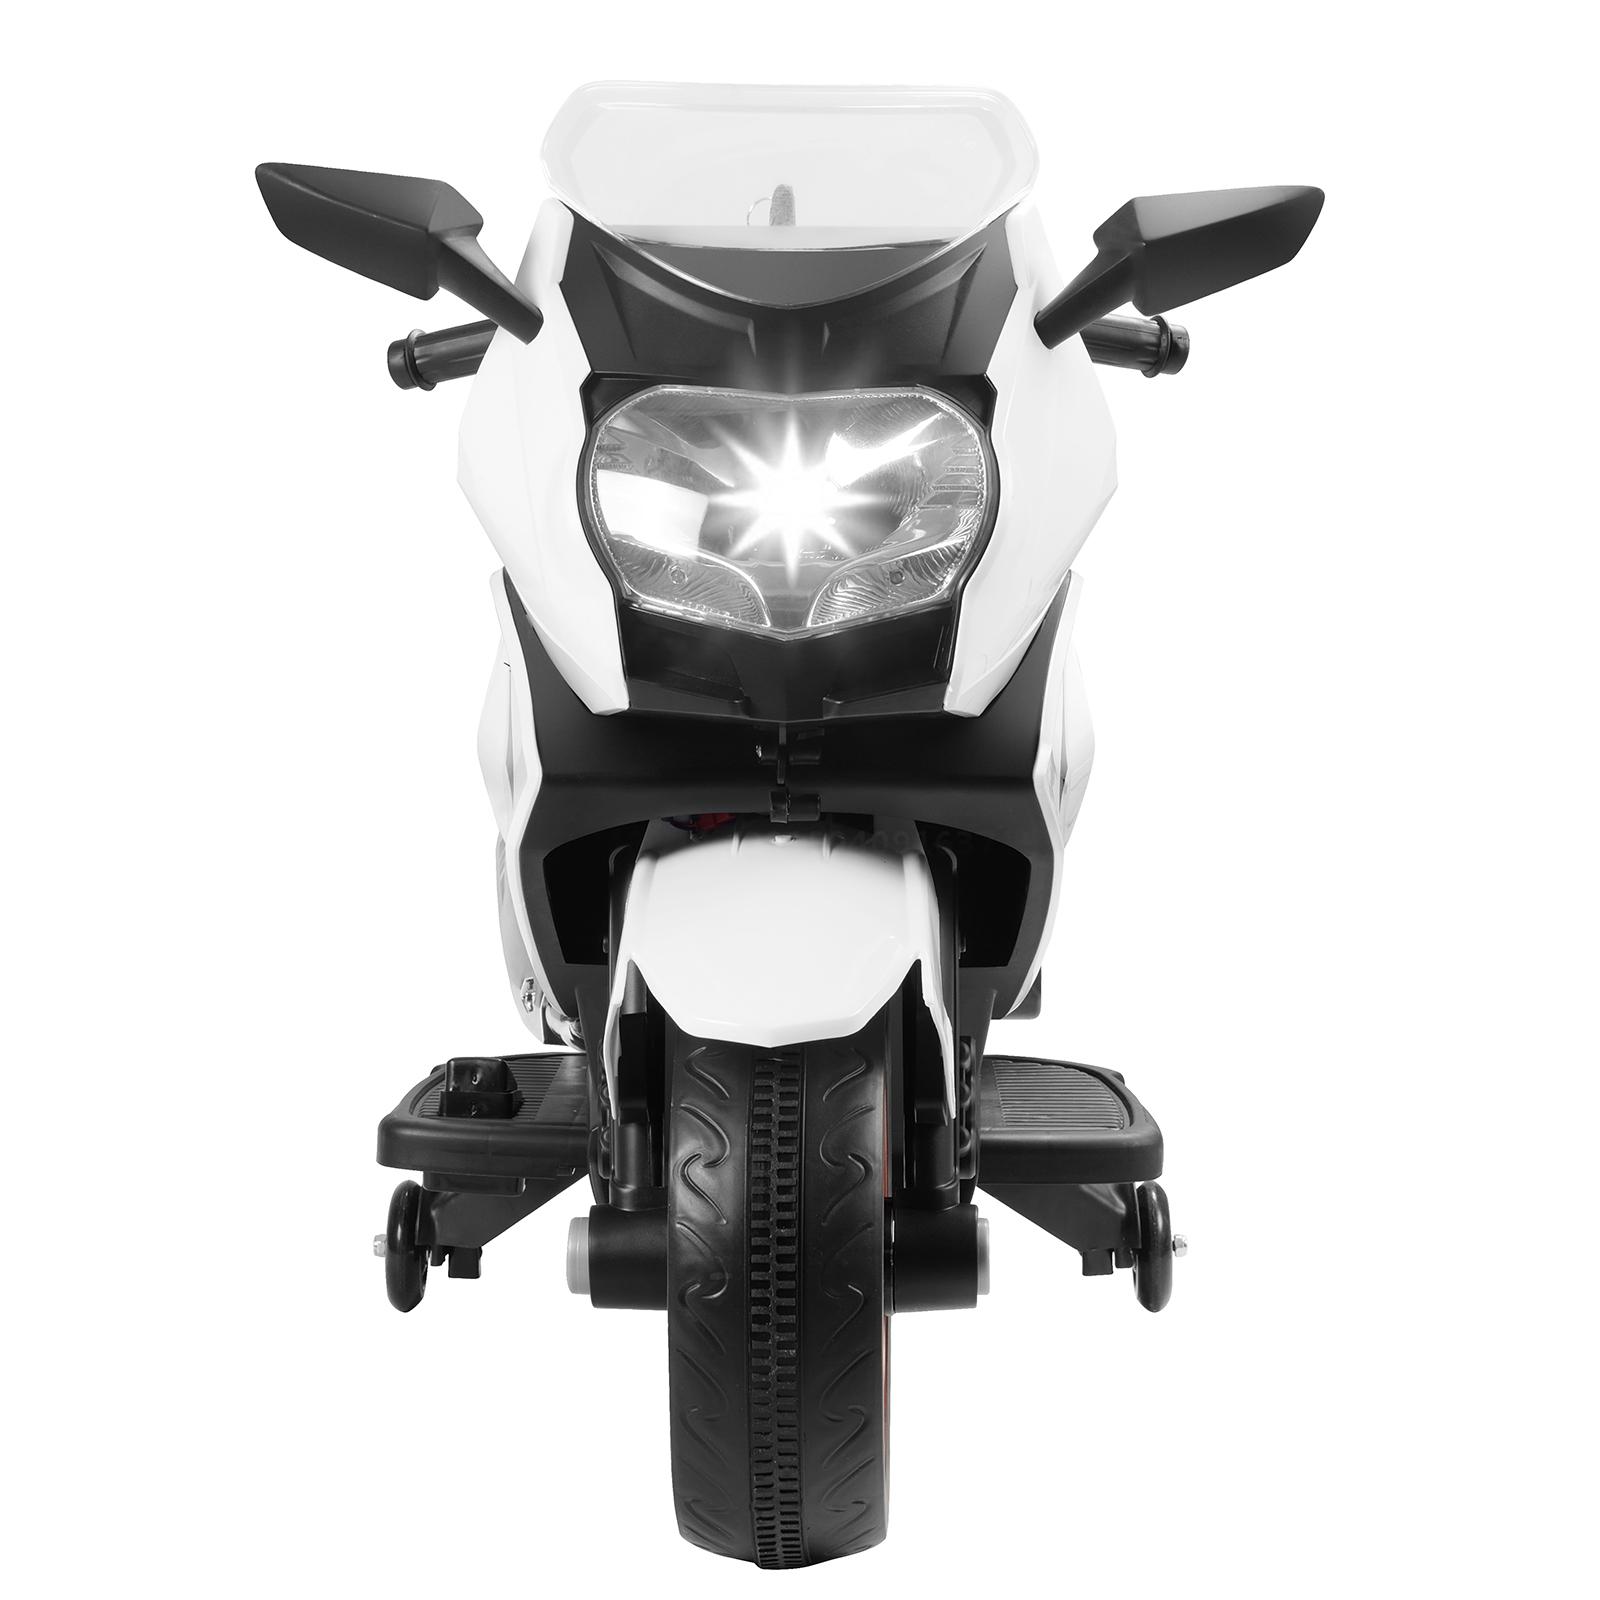 https://igiroskuter.ru/images/upload/2%20Мотоцикл%20Moto%20ХМХ%20316%20Белый%20(ХМХ316%20Б).jpg